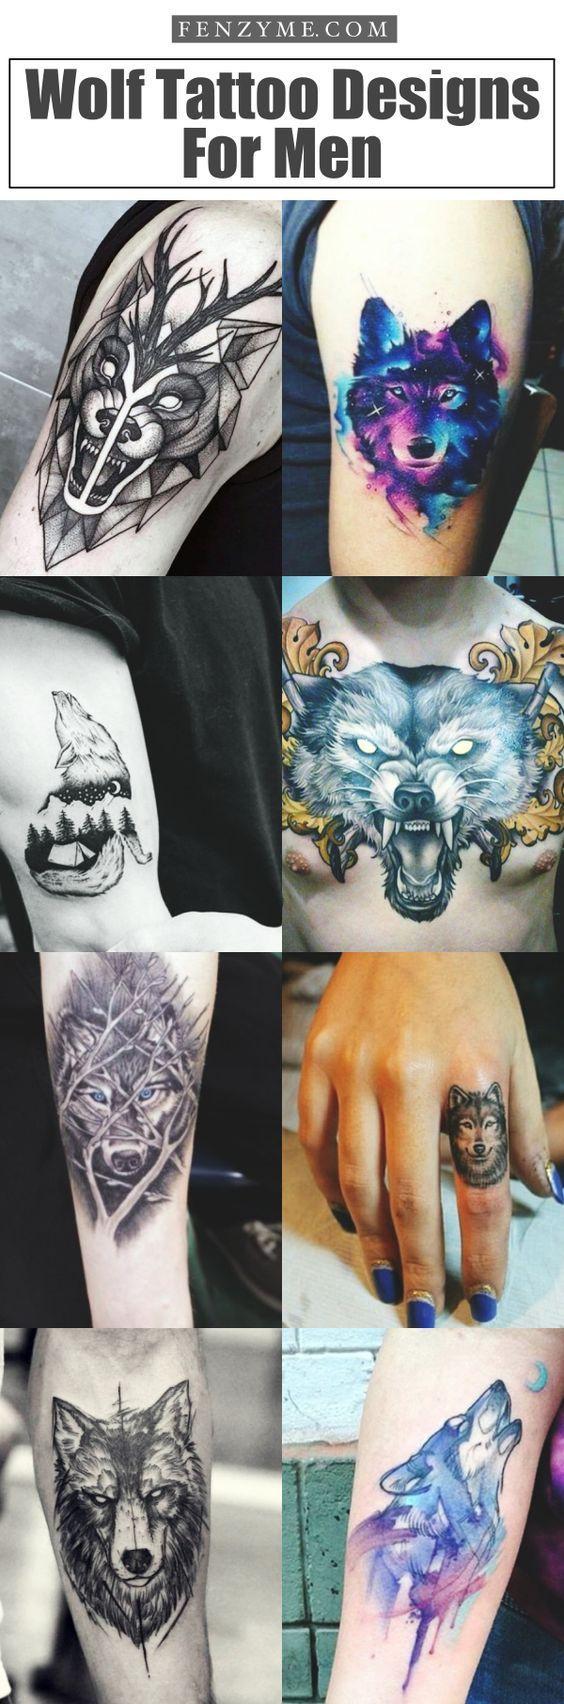 40 Unique Hand Tattoos For Men – Manly Ink Design Ideas forecasting